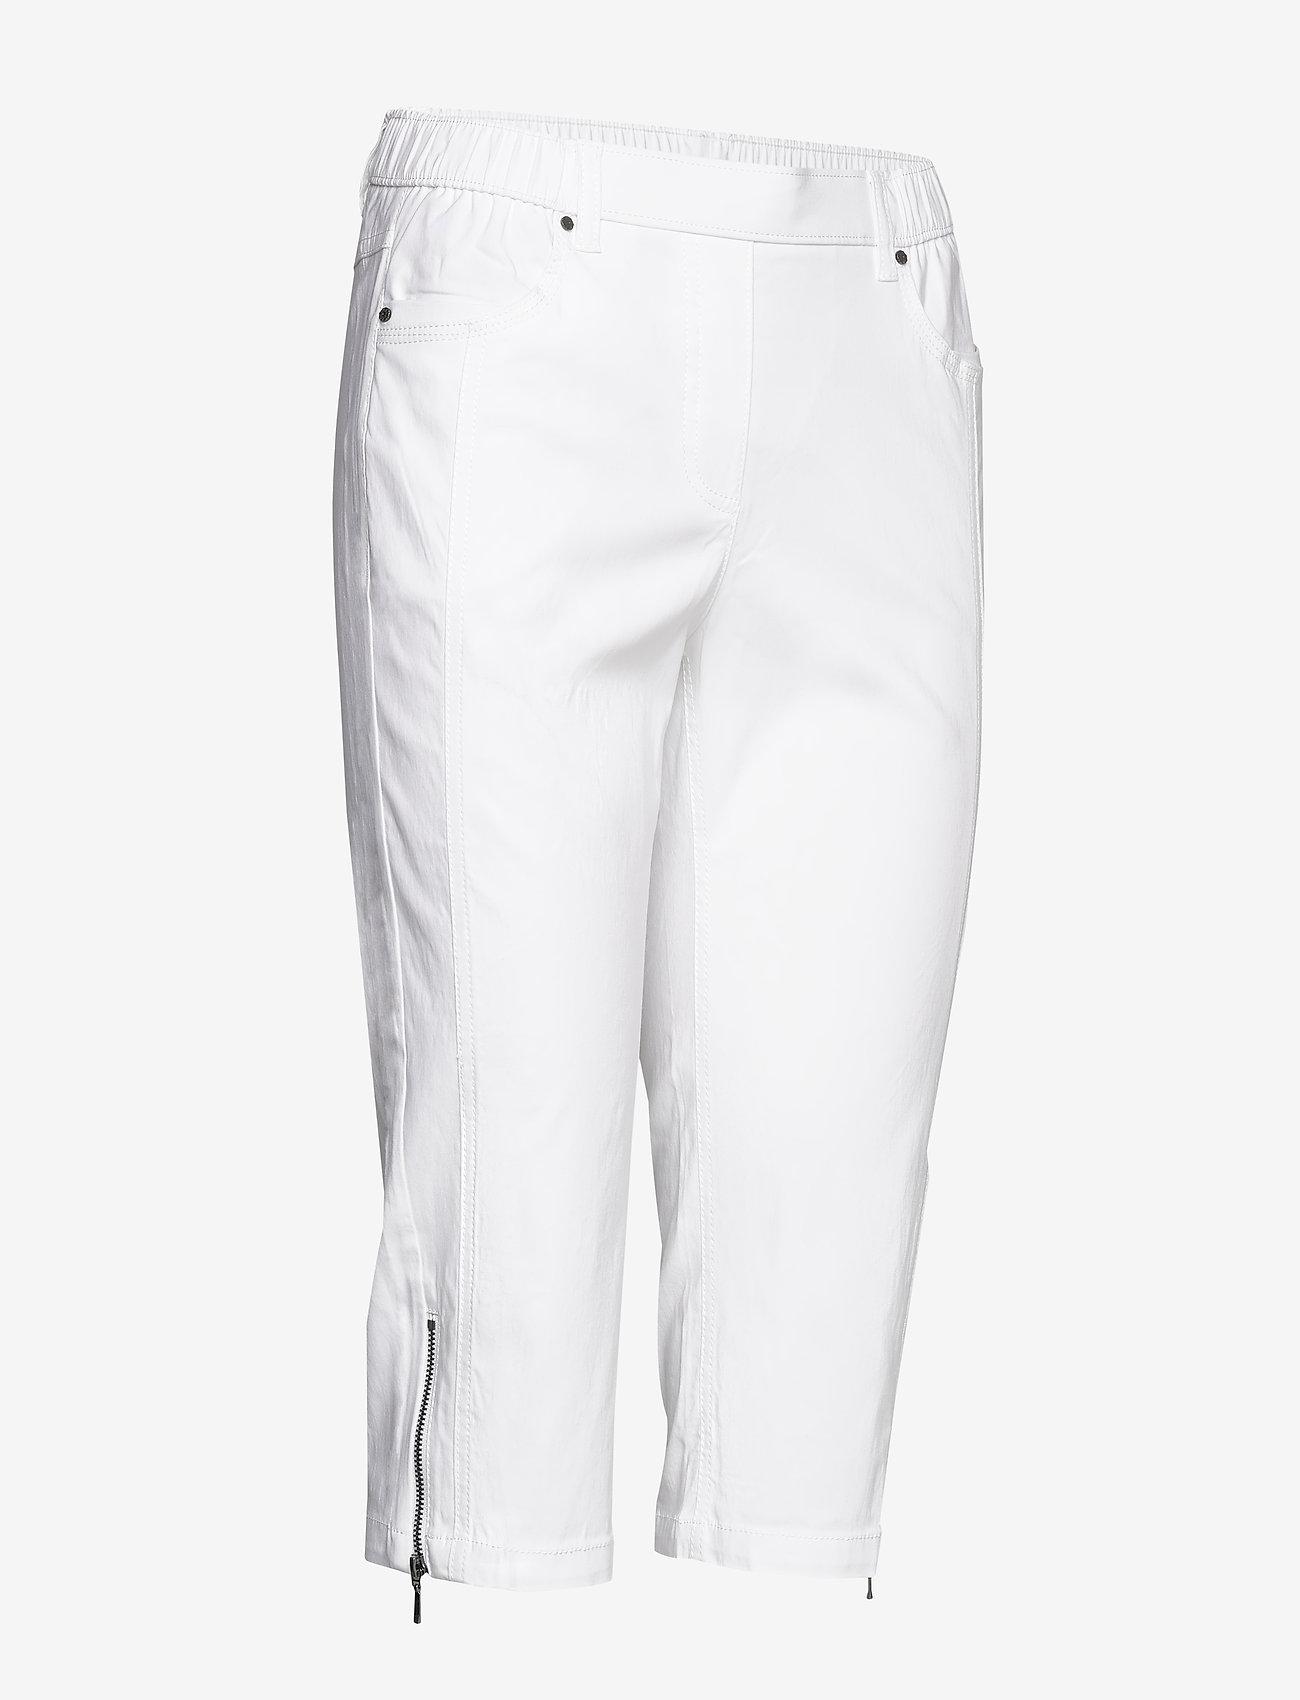 Brandtex Capri pants - Spodnie WHITE - Kobiety Odzież.